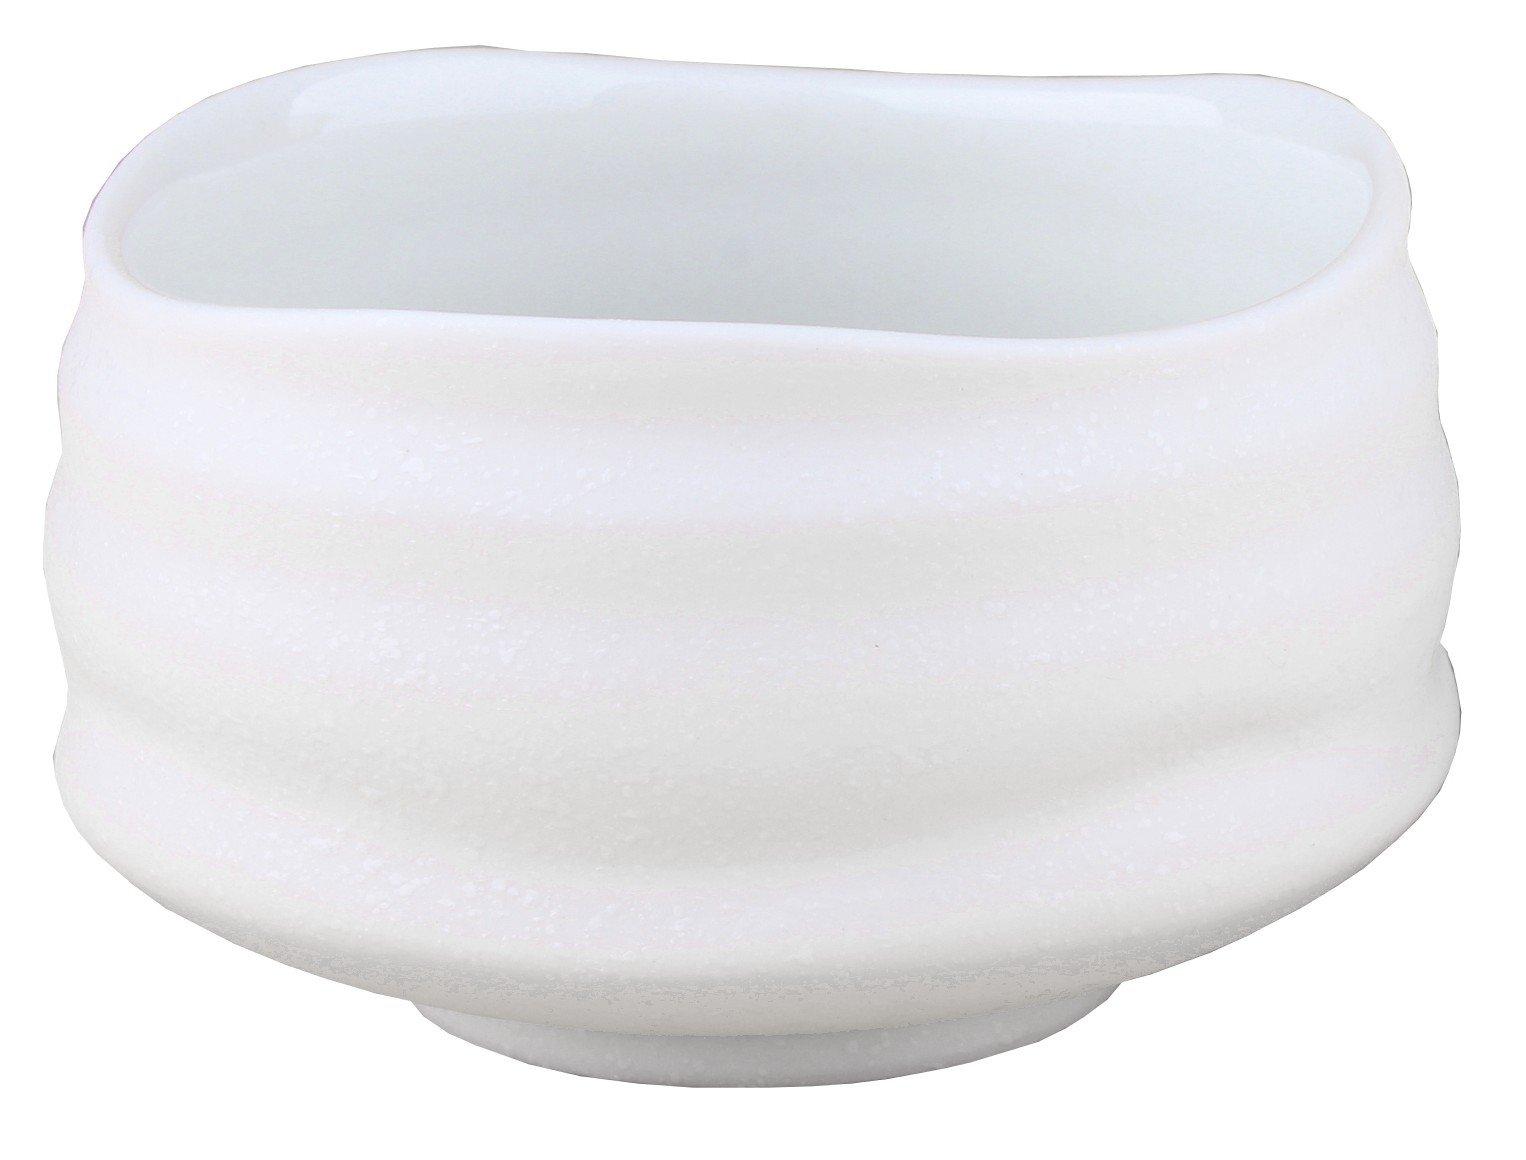 Goodwei Japanese Matcha Ceremonial Tea Bowl 15oz, 4.7 in. (no Whisk Holder, Miyuki)